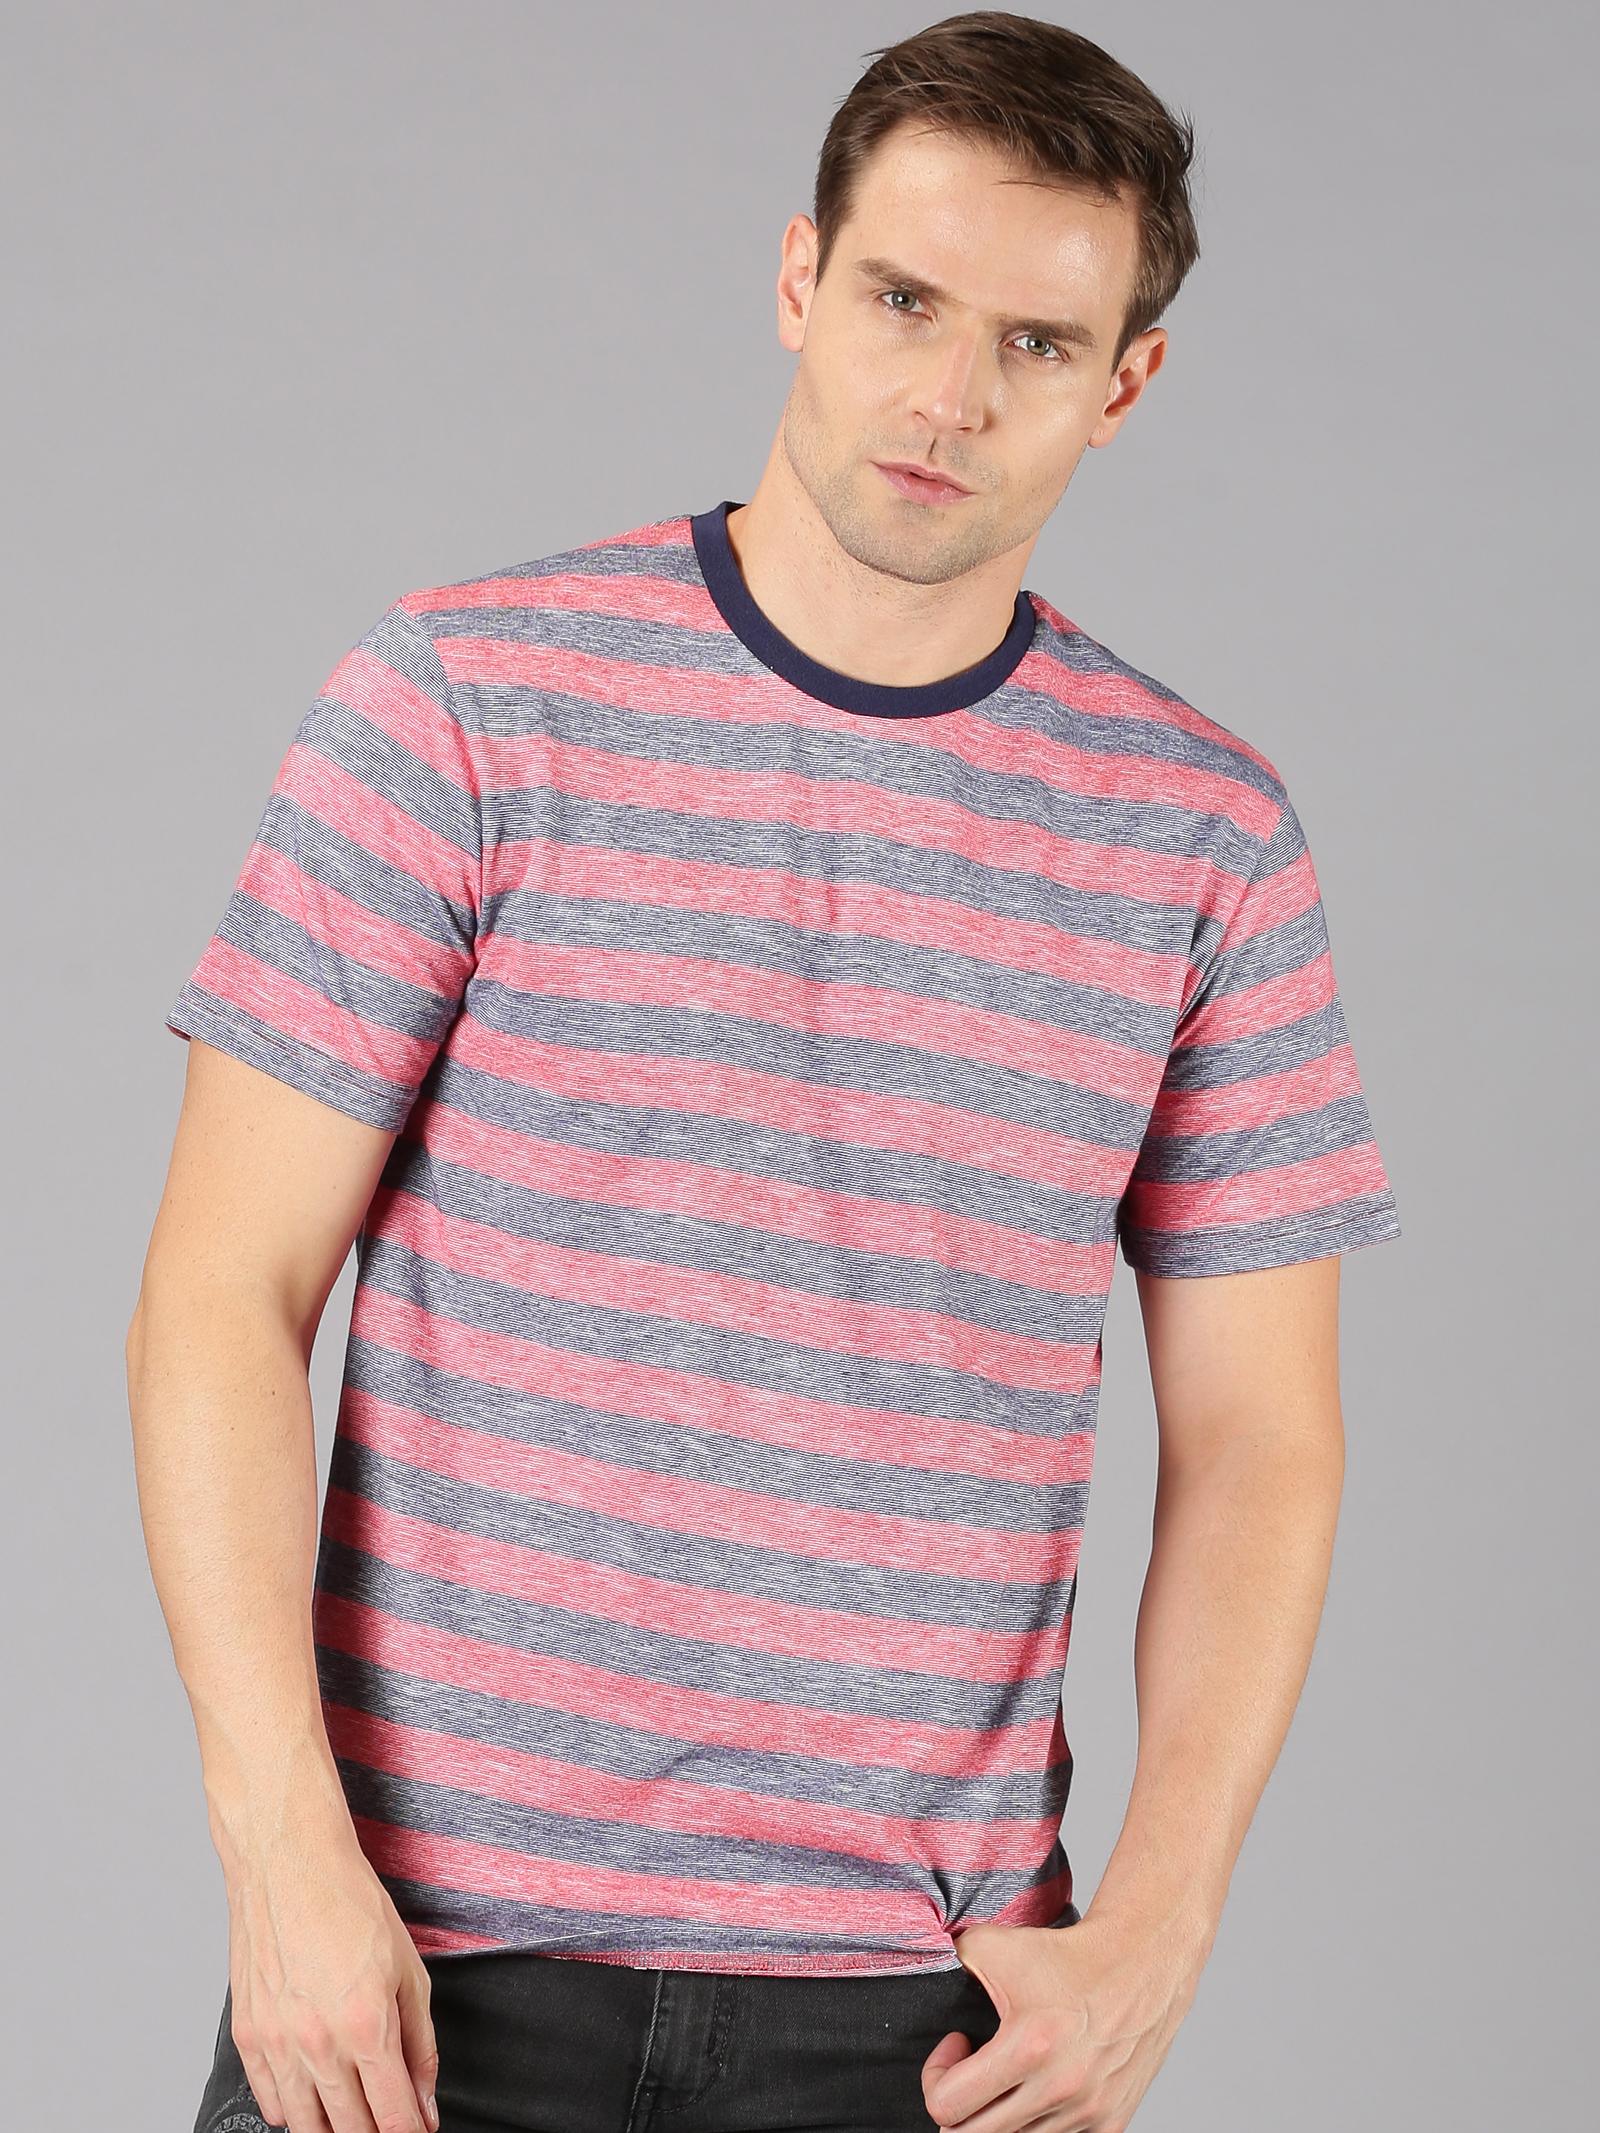 UrGear | UrGear Striped Men Round Neck Multicolor T-Shirt